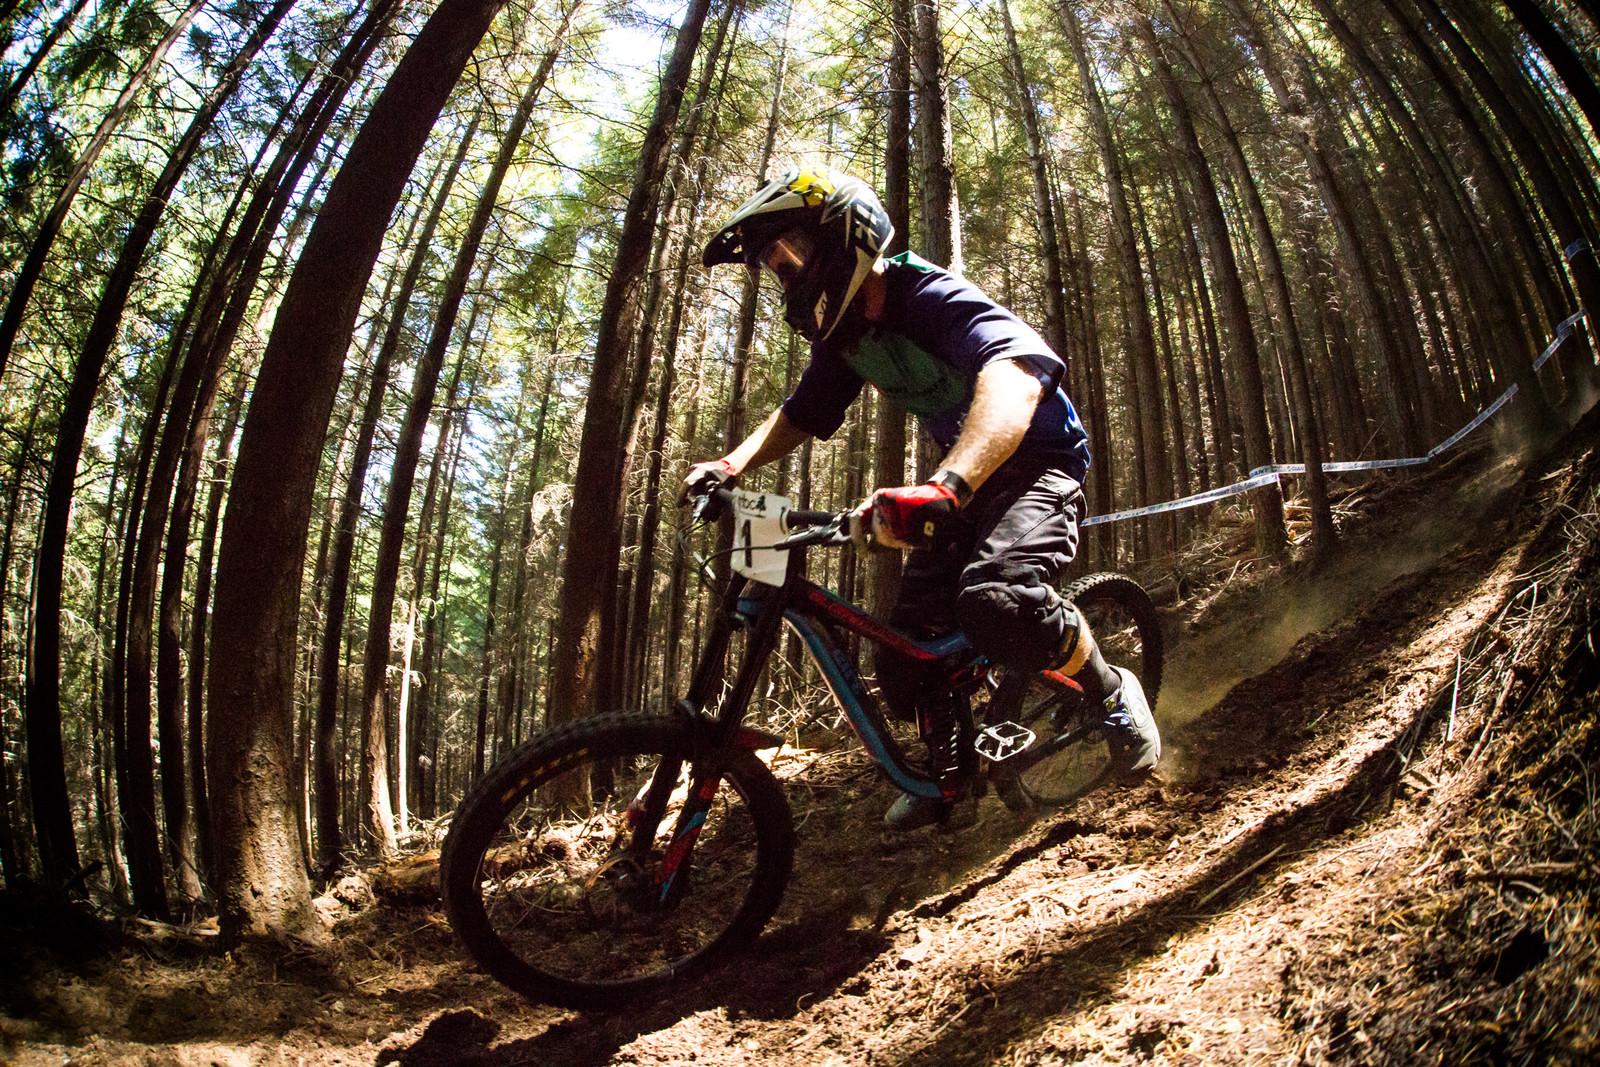 Si Smith - Homegrown NZ Downhill - Vertigo Bikes Ride More DH Series Race 1 - Mountain Biking Pictures - Vital MTB